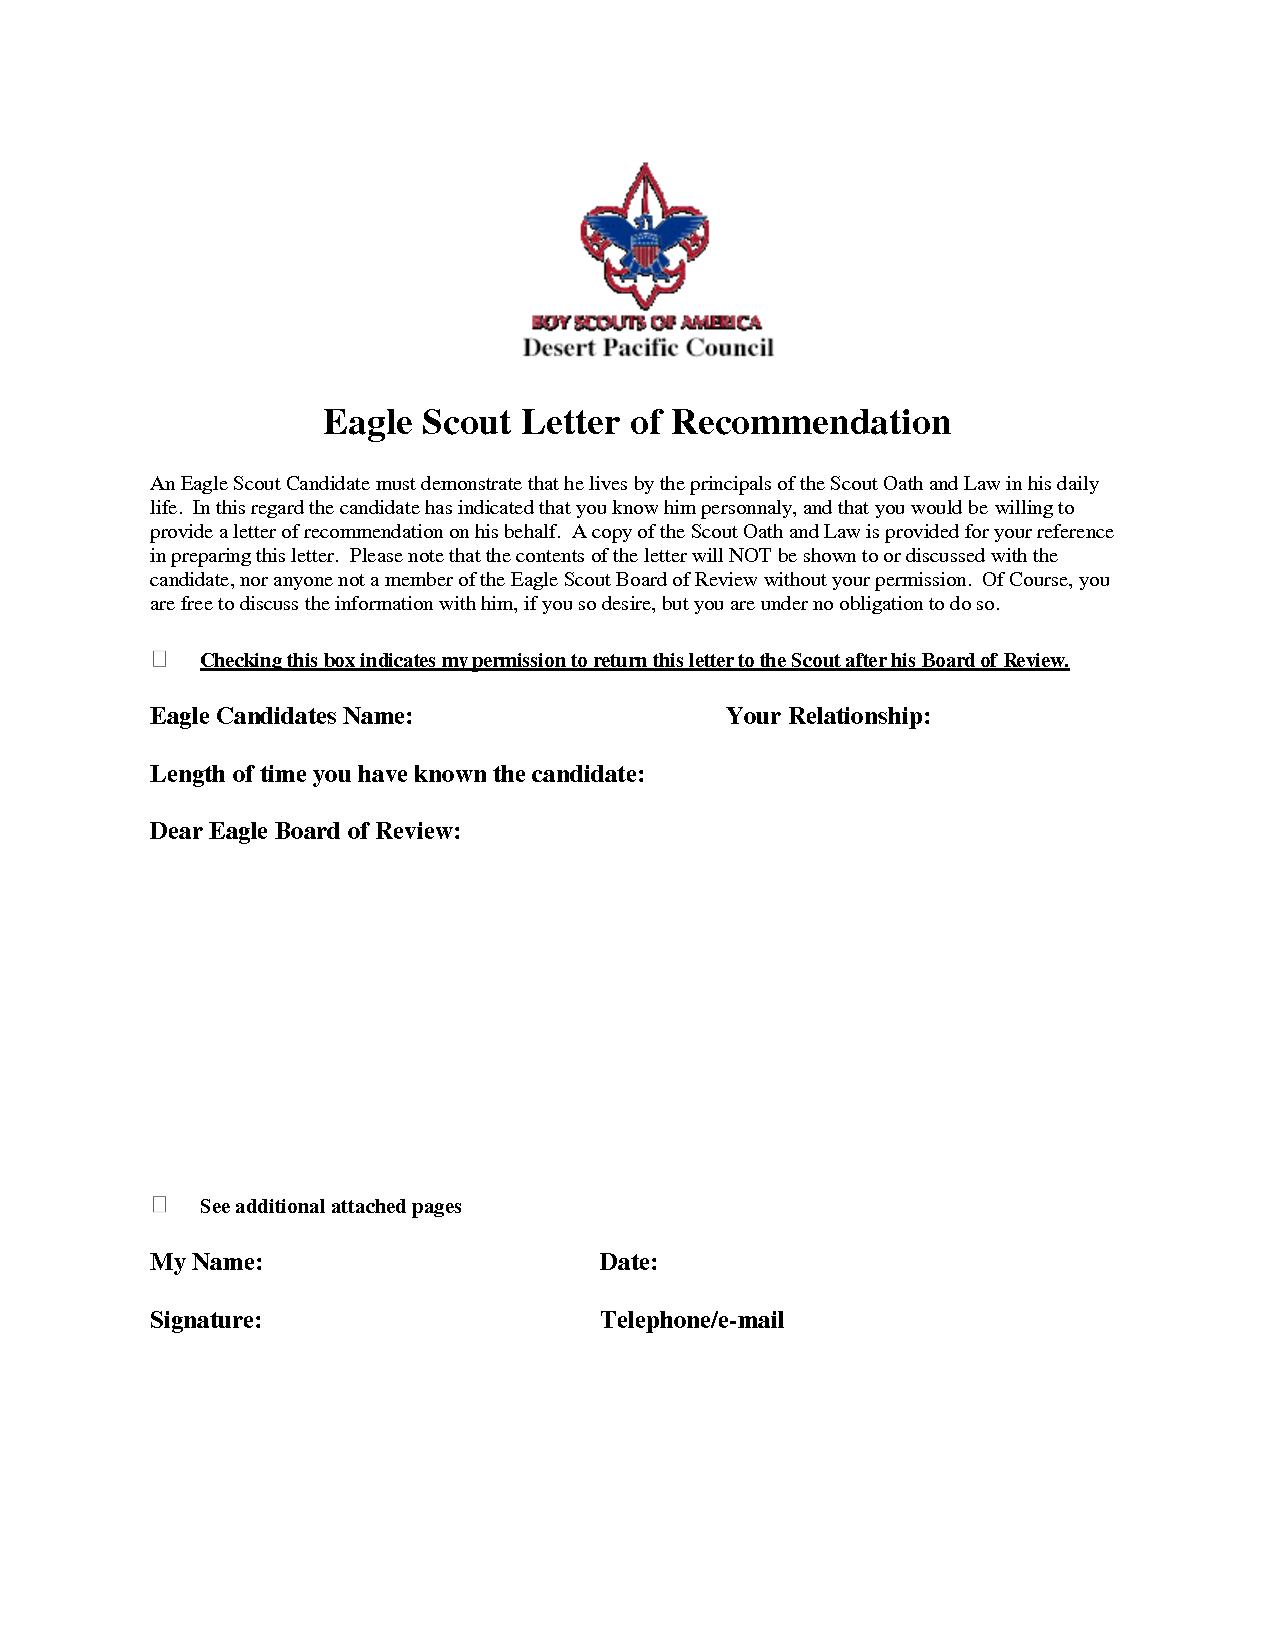 Eagle Recommendation Letter Template - Eagle Scout Re Mendation Letter Sample